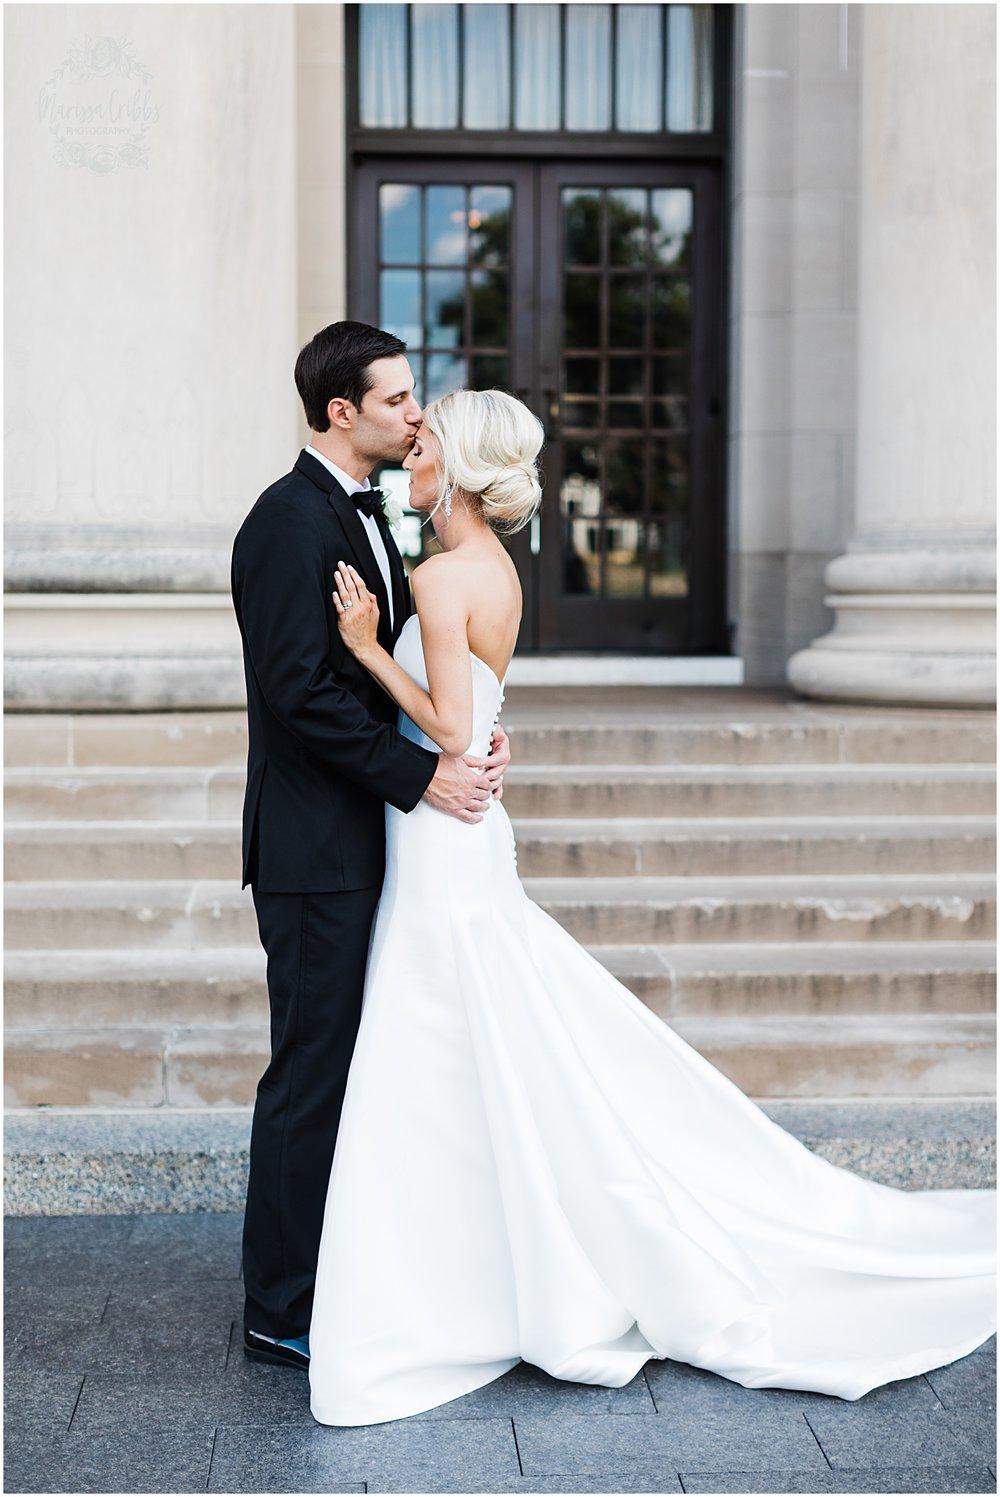 NOLL WEDDING | THE BRASS ON BALTIMORE | MARISSA CRIBBS PHOTOGRAPHY_6337.jpg